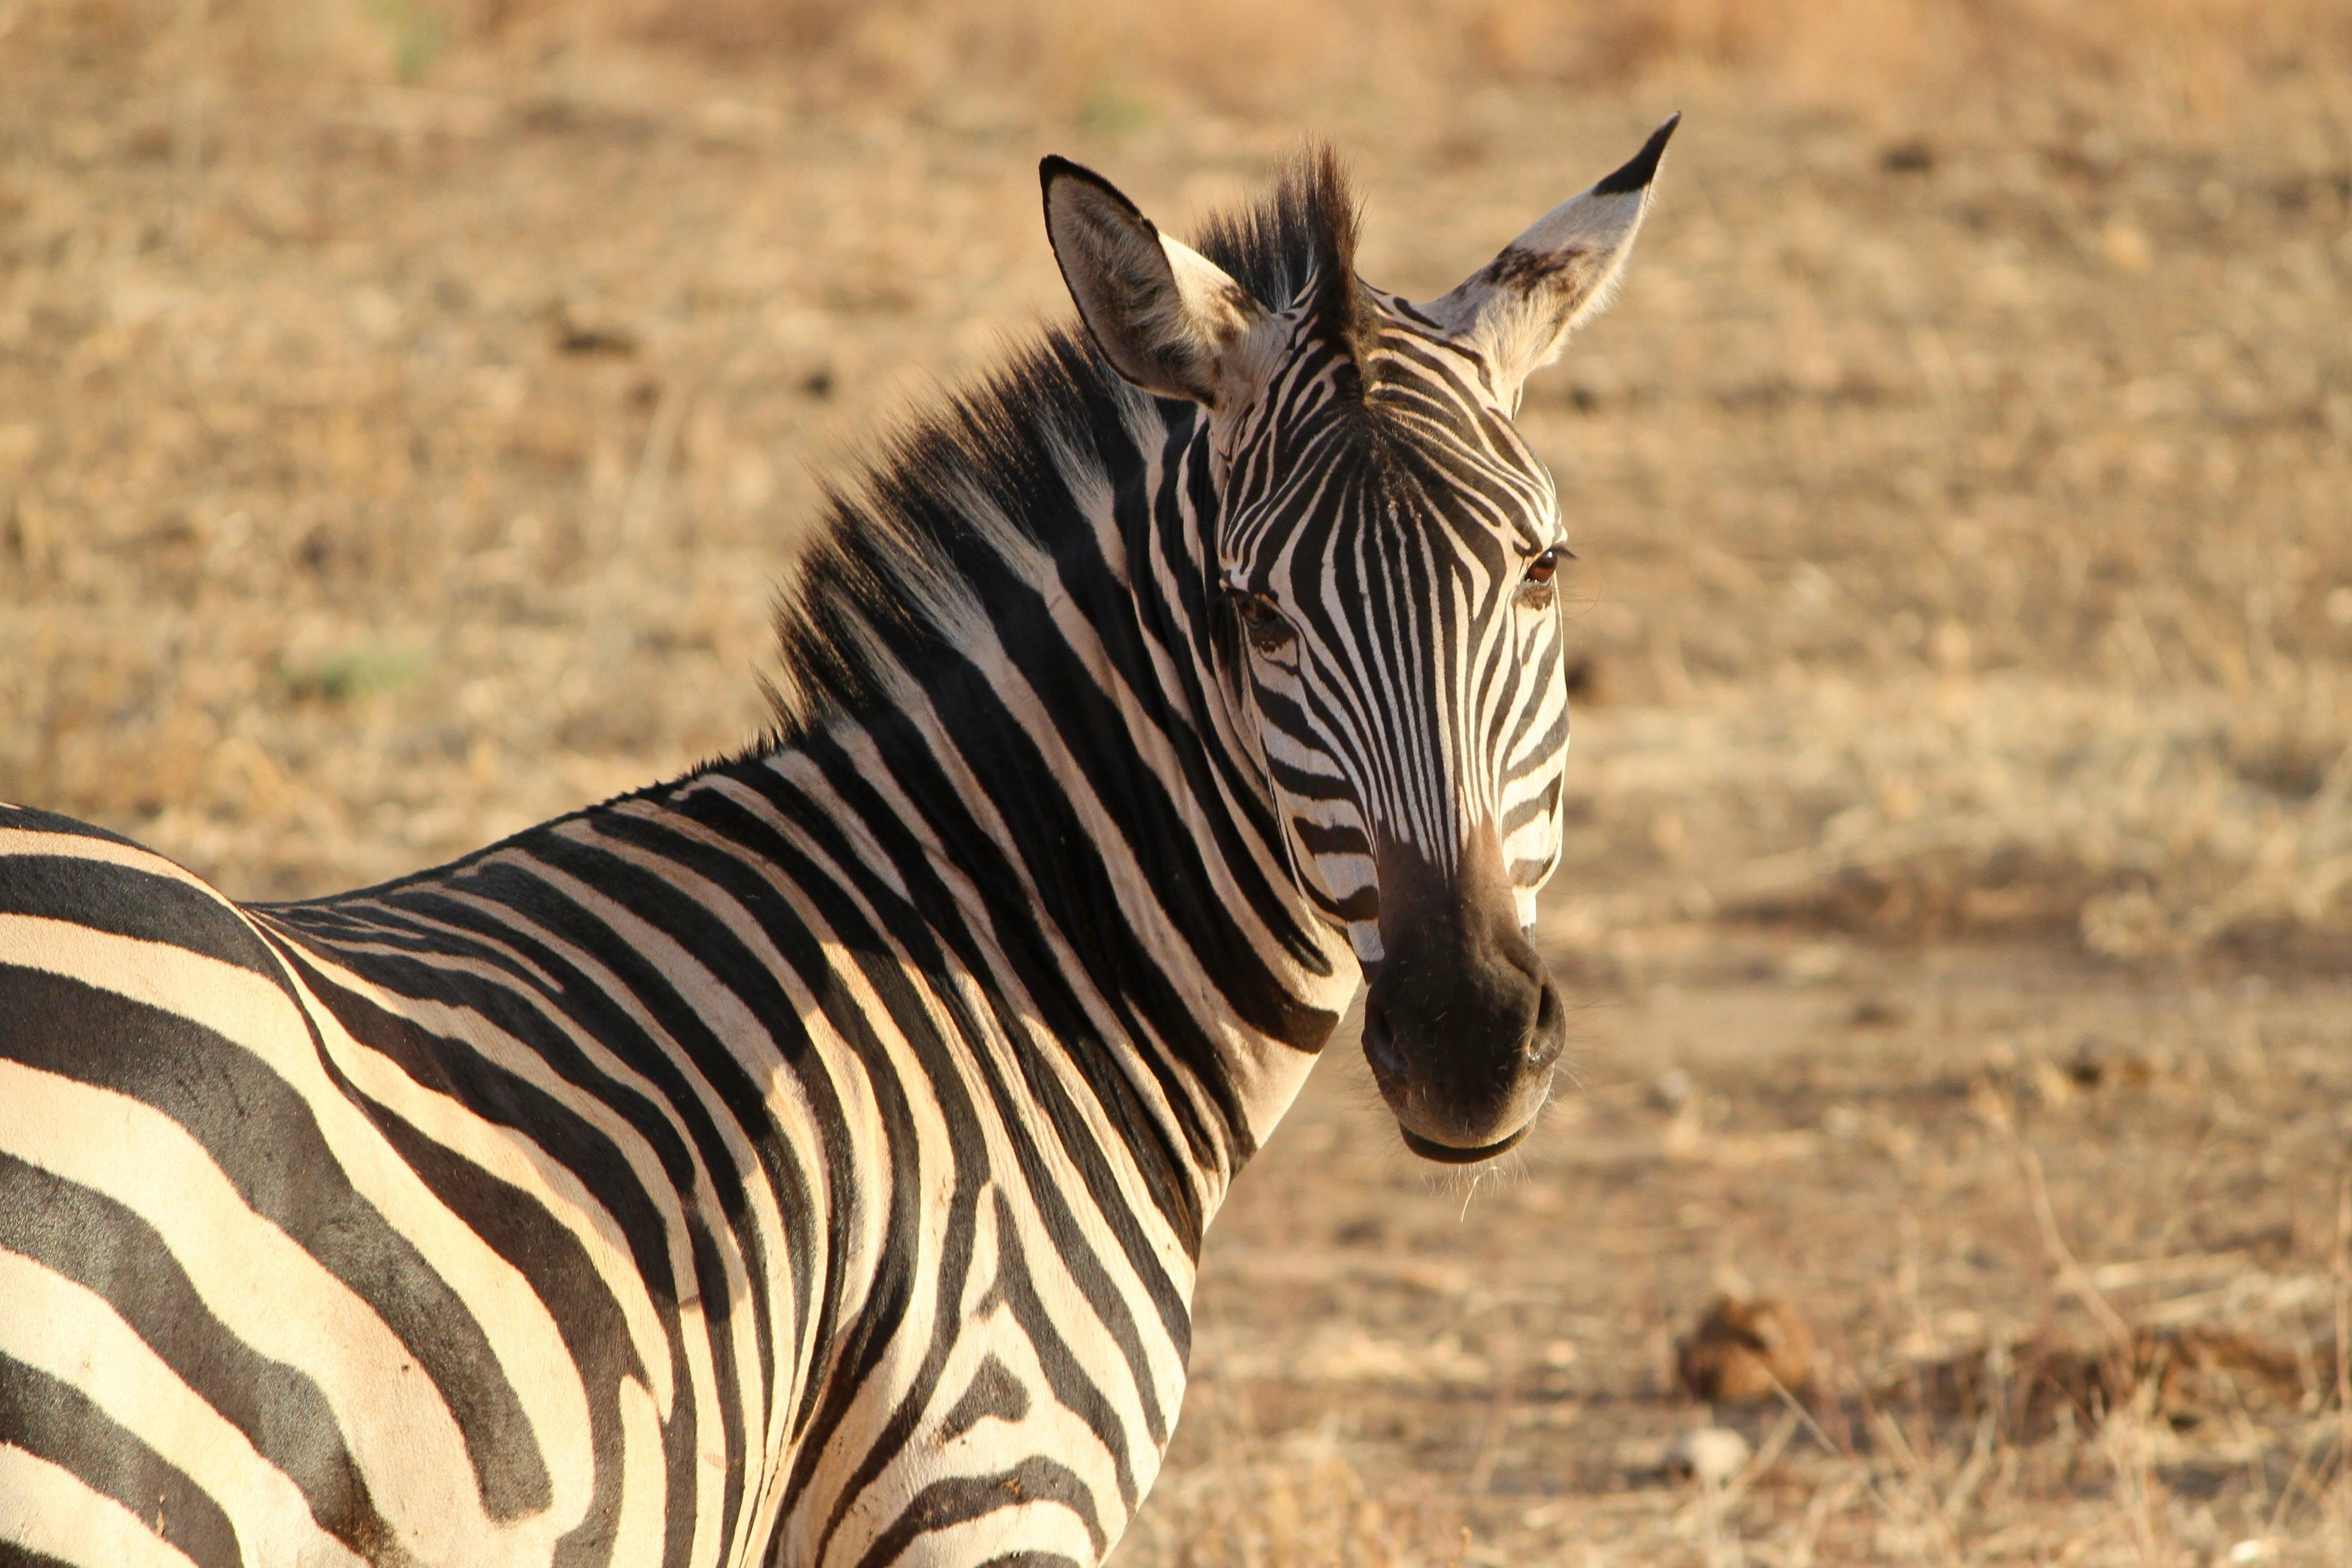 Black and White Zebra Standing during Daytime